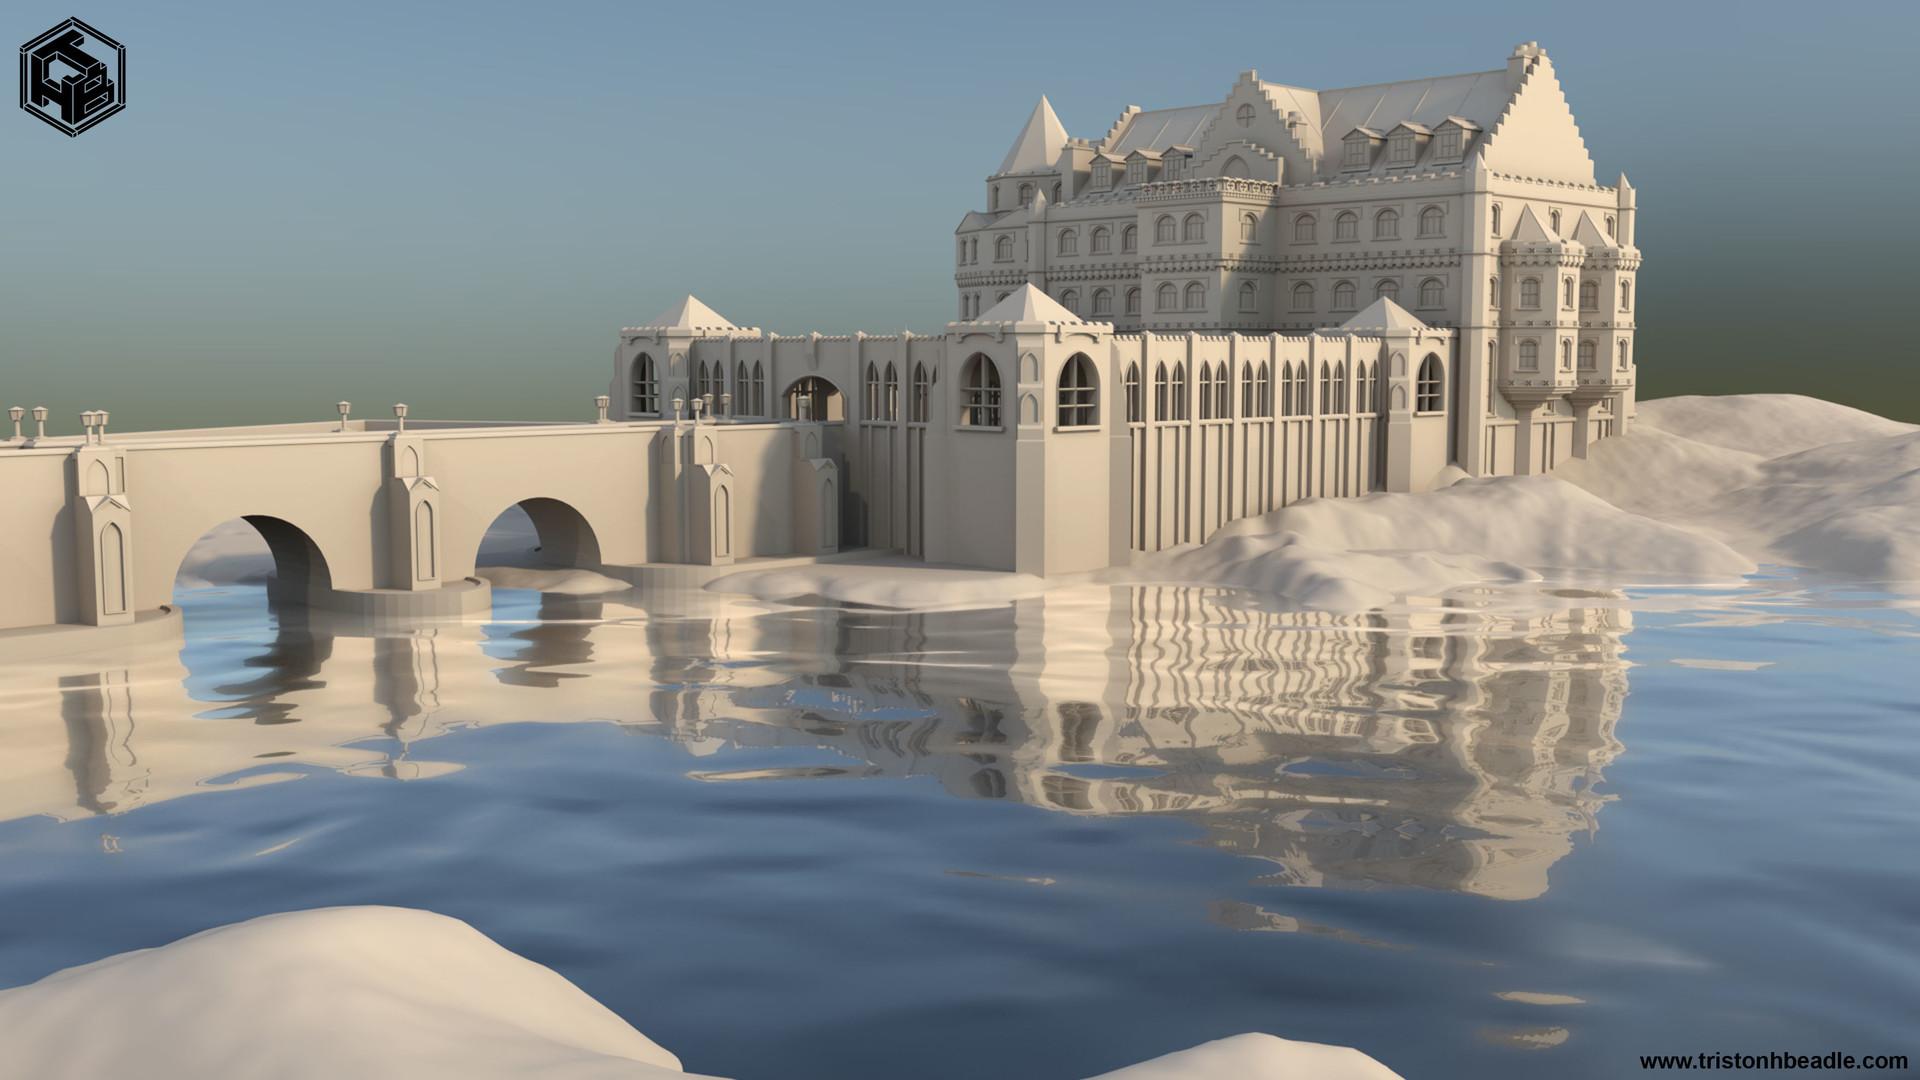 Triston beadle castle 02